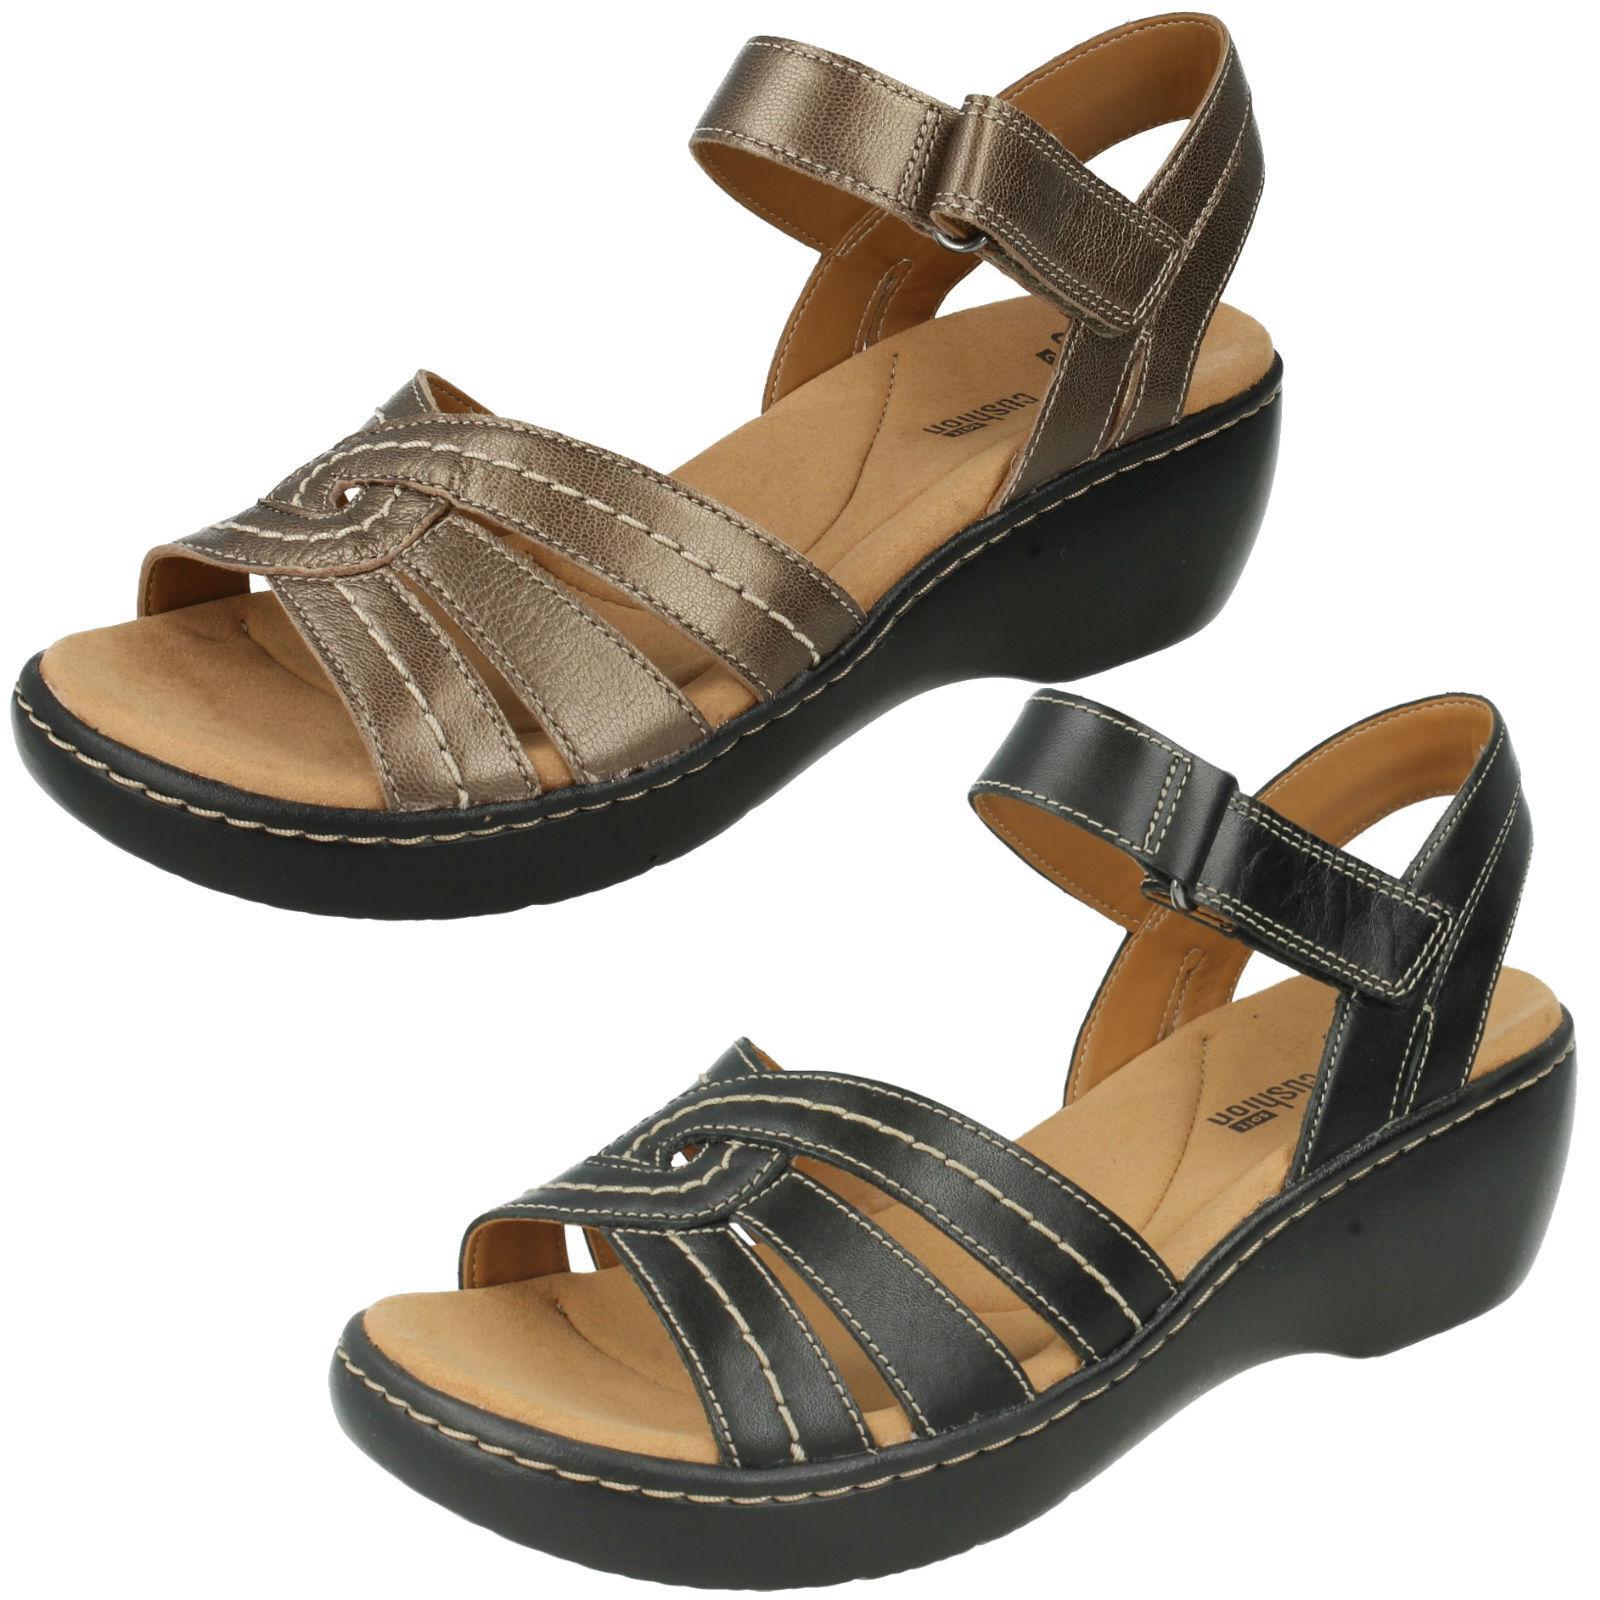 Delana Varro Damen Klettverschluss Clarks Leder offene Zeh Klettverschluss Damen Keilabsatz Sandalen a15298